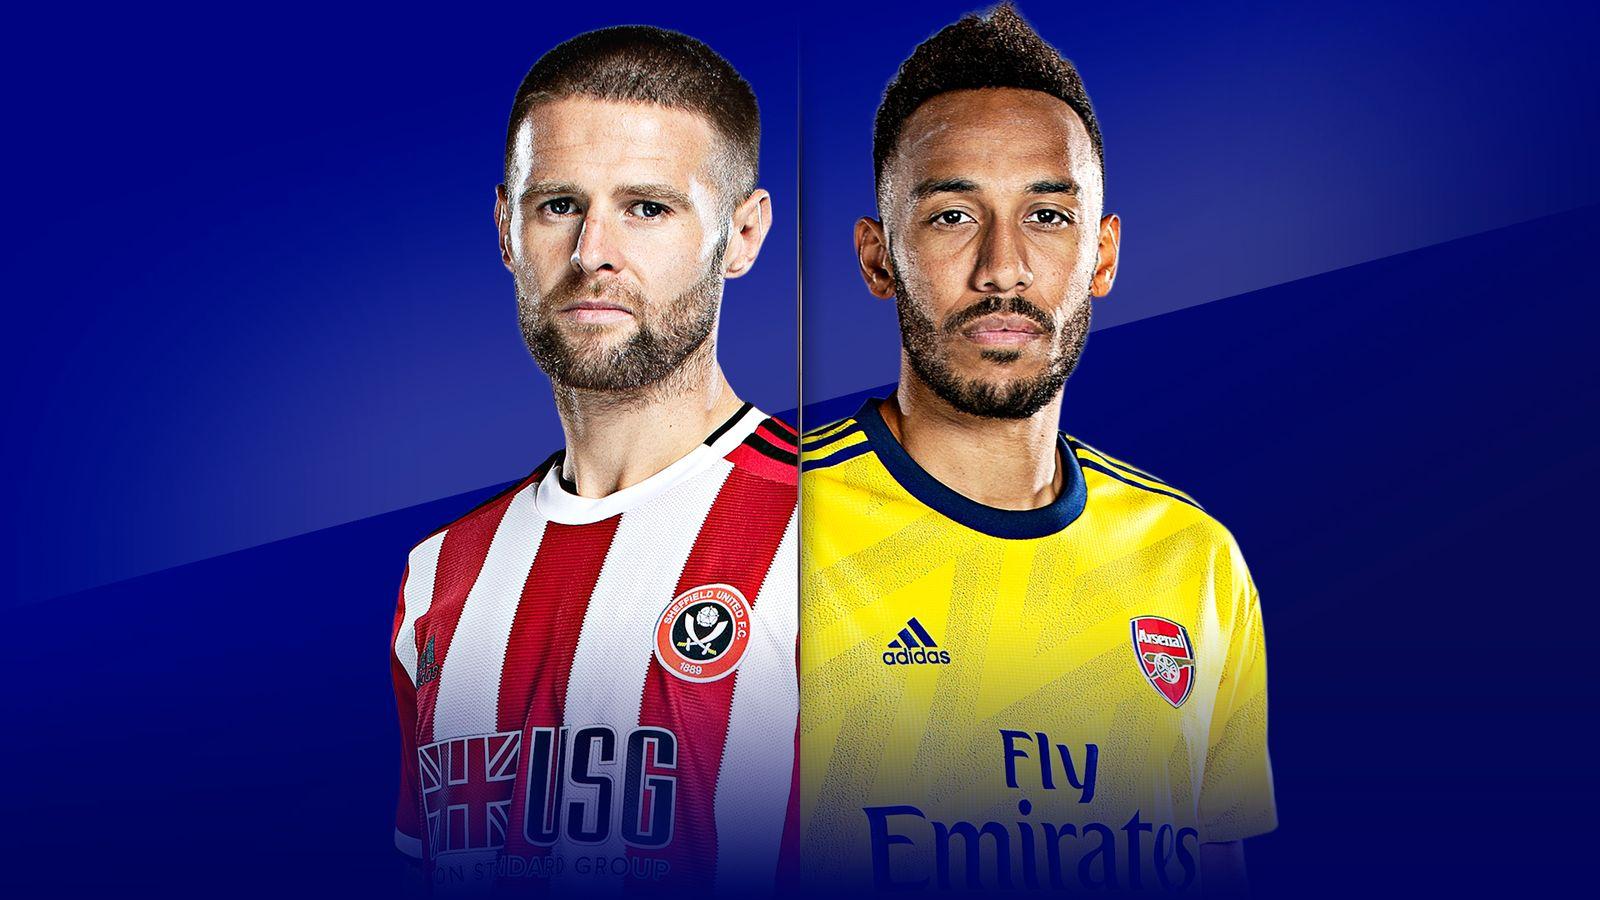 Match Preview - Sheff Utd vs Arsenal | 21 Oct 2019